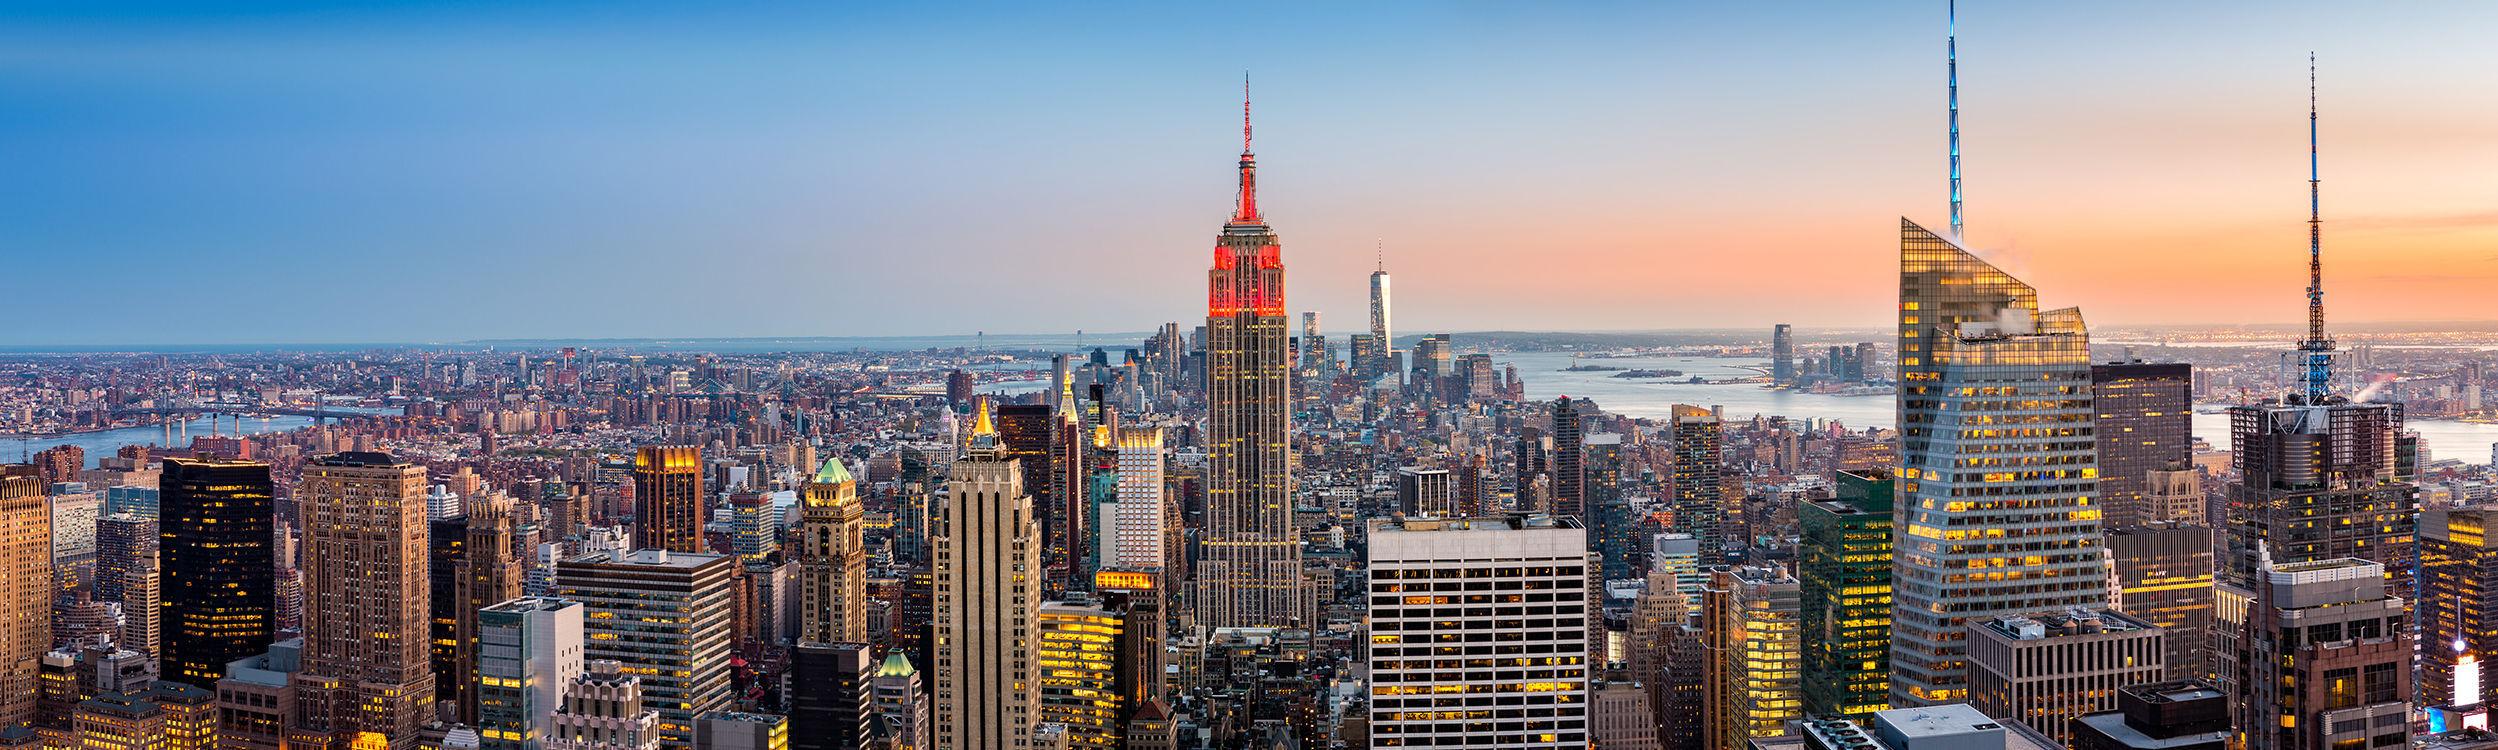 New-York City Skyline